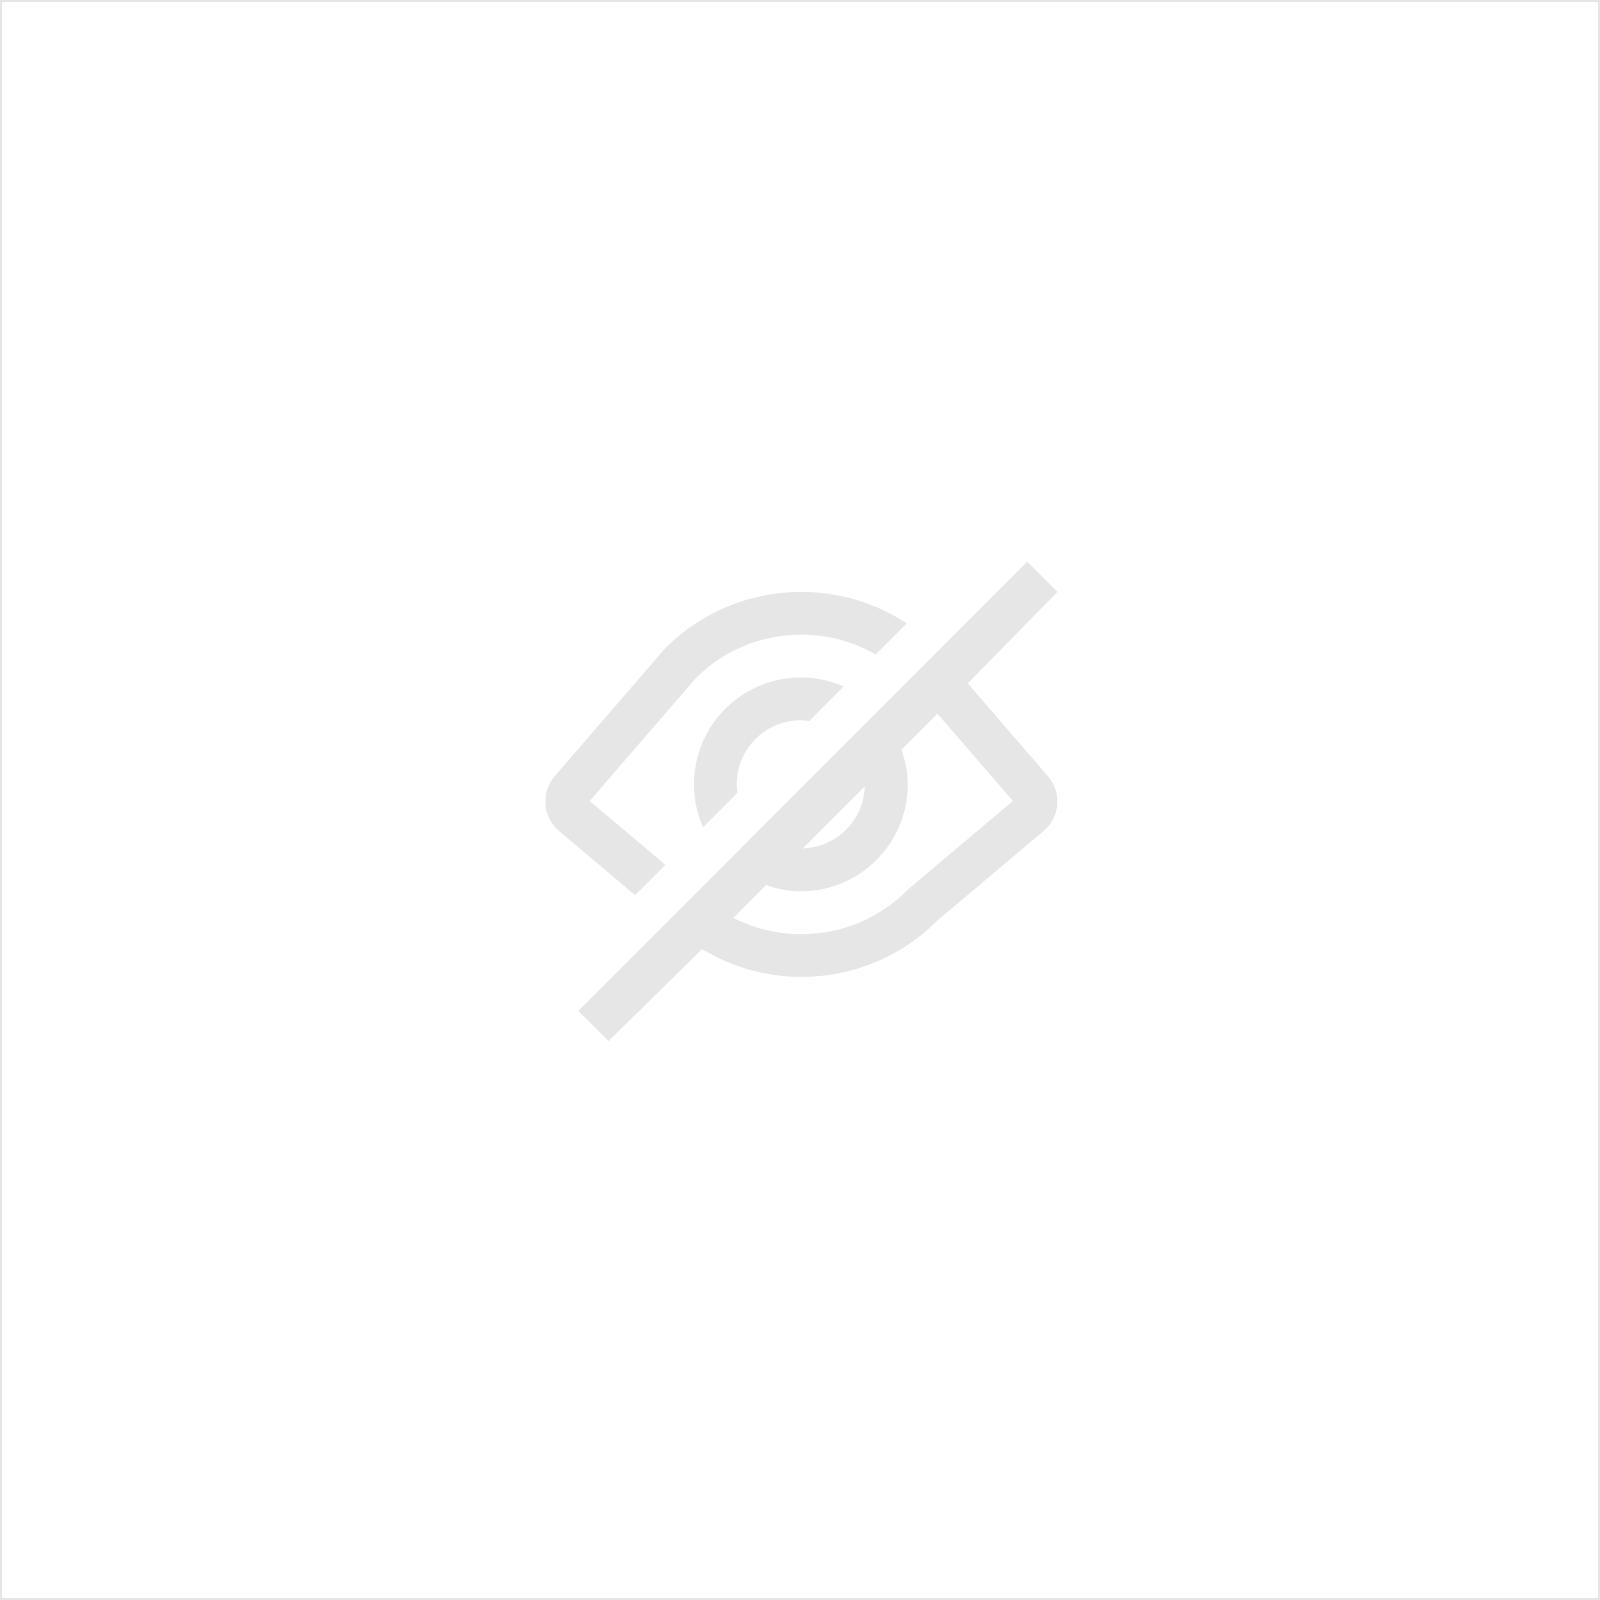 JEU DE MOLETTES OPTIONNELLES - STANDARD FULL RADIUS TANK ROLL - POUR BORDEUSE MOULUREUSE